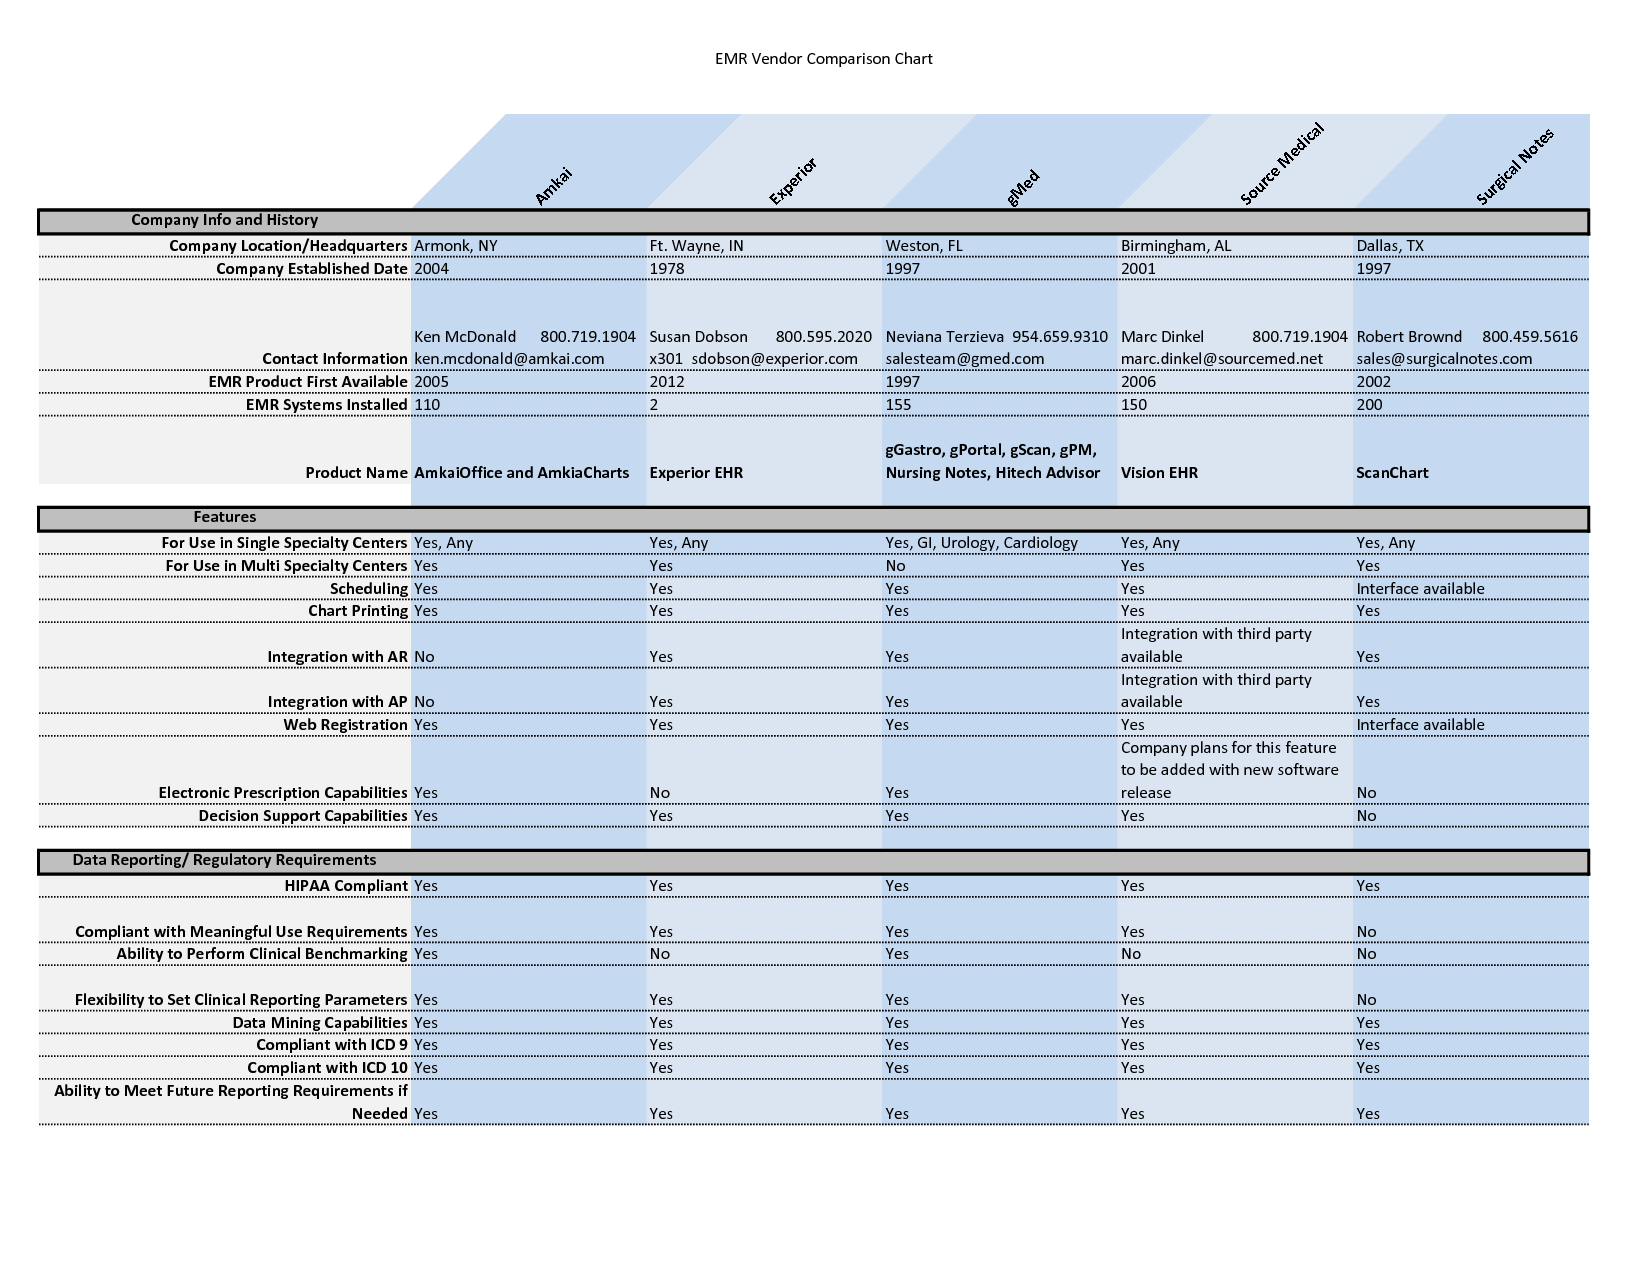 Vendor Comparison Spreadsheet Template As Spreadsheet Templates Inside Comparison Spreadsheet Template